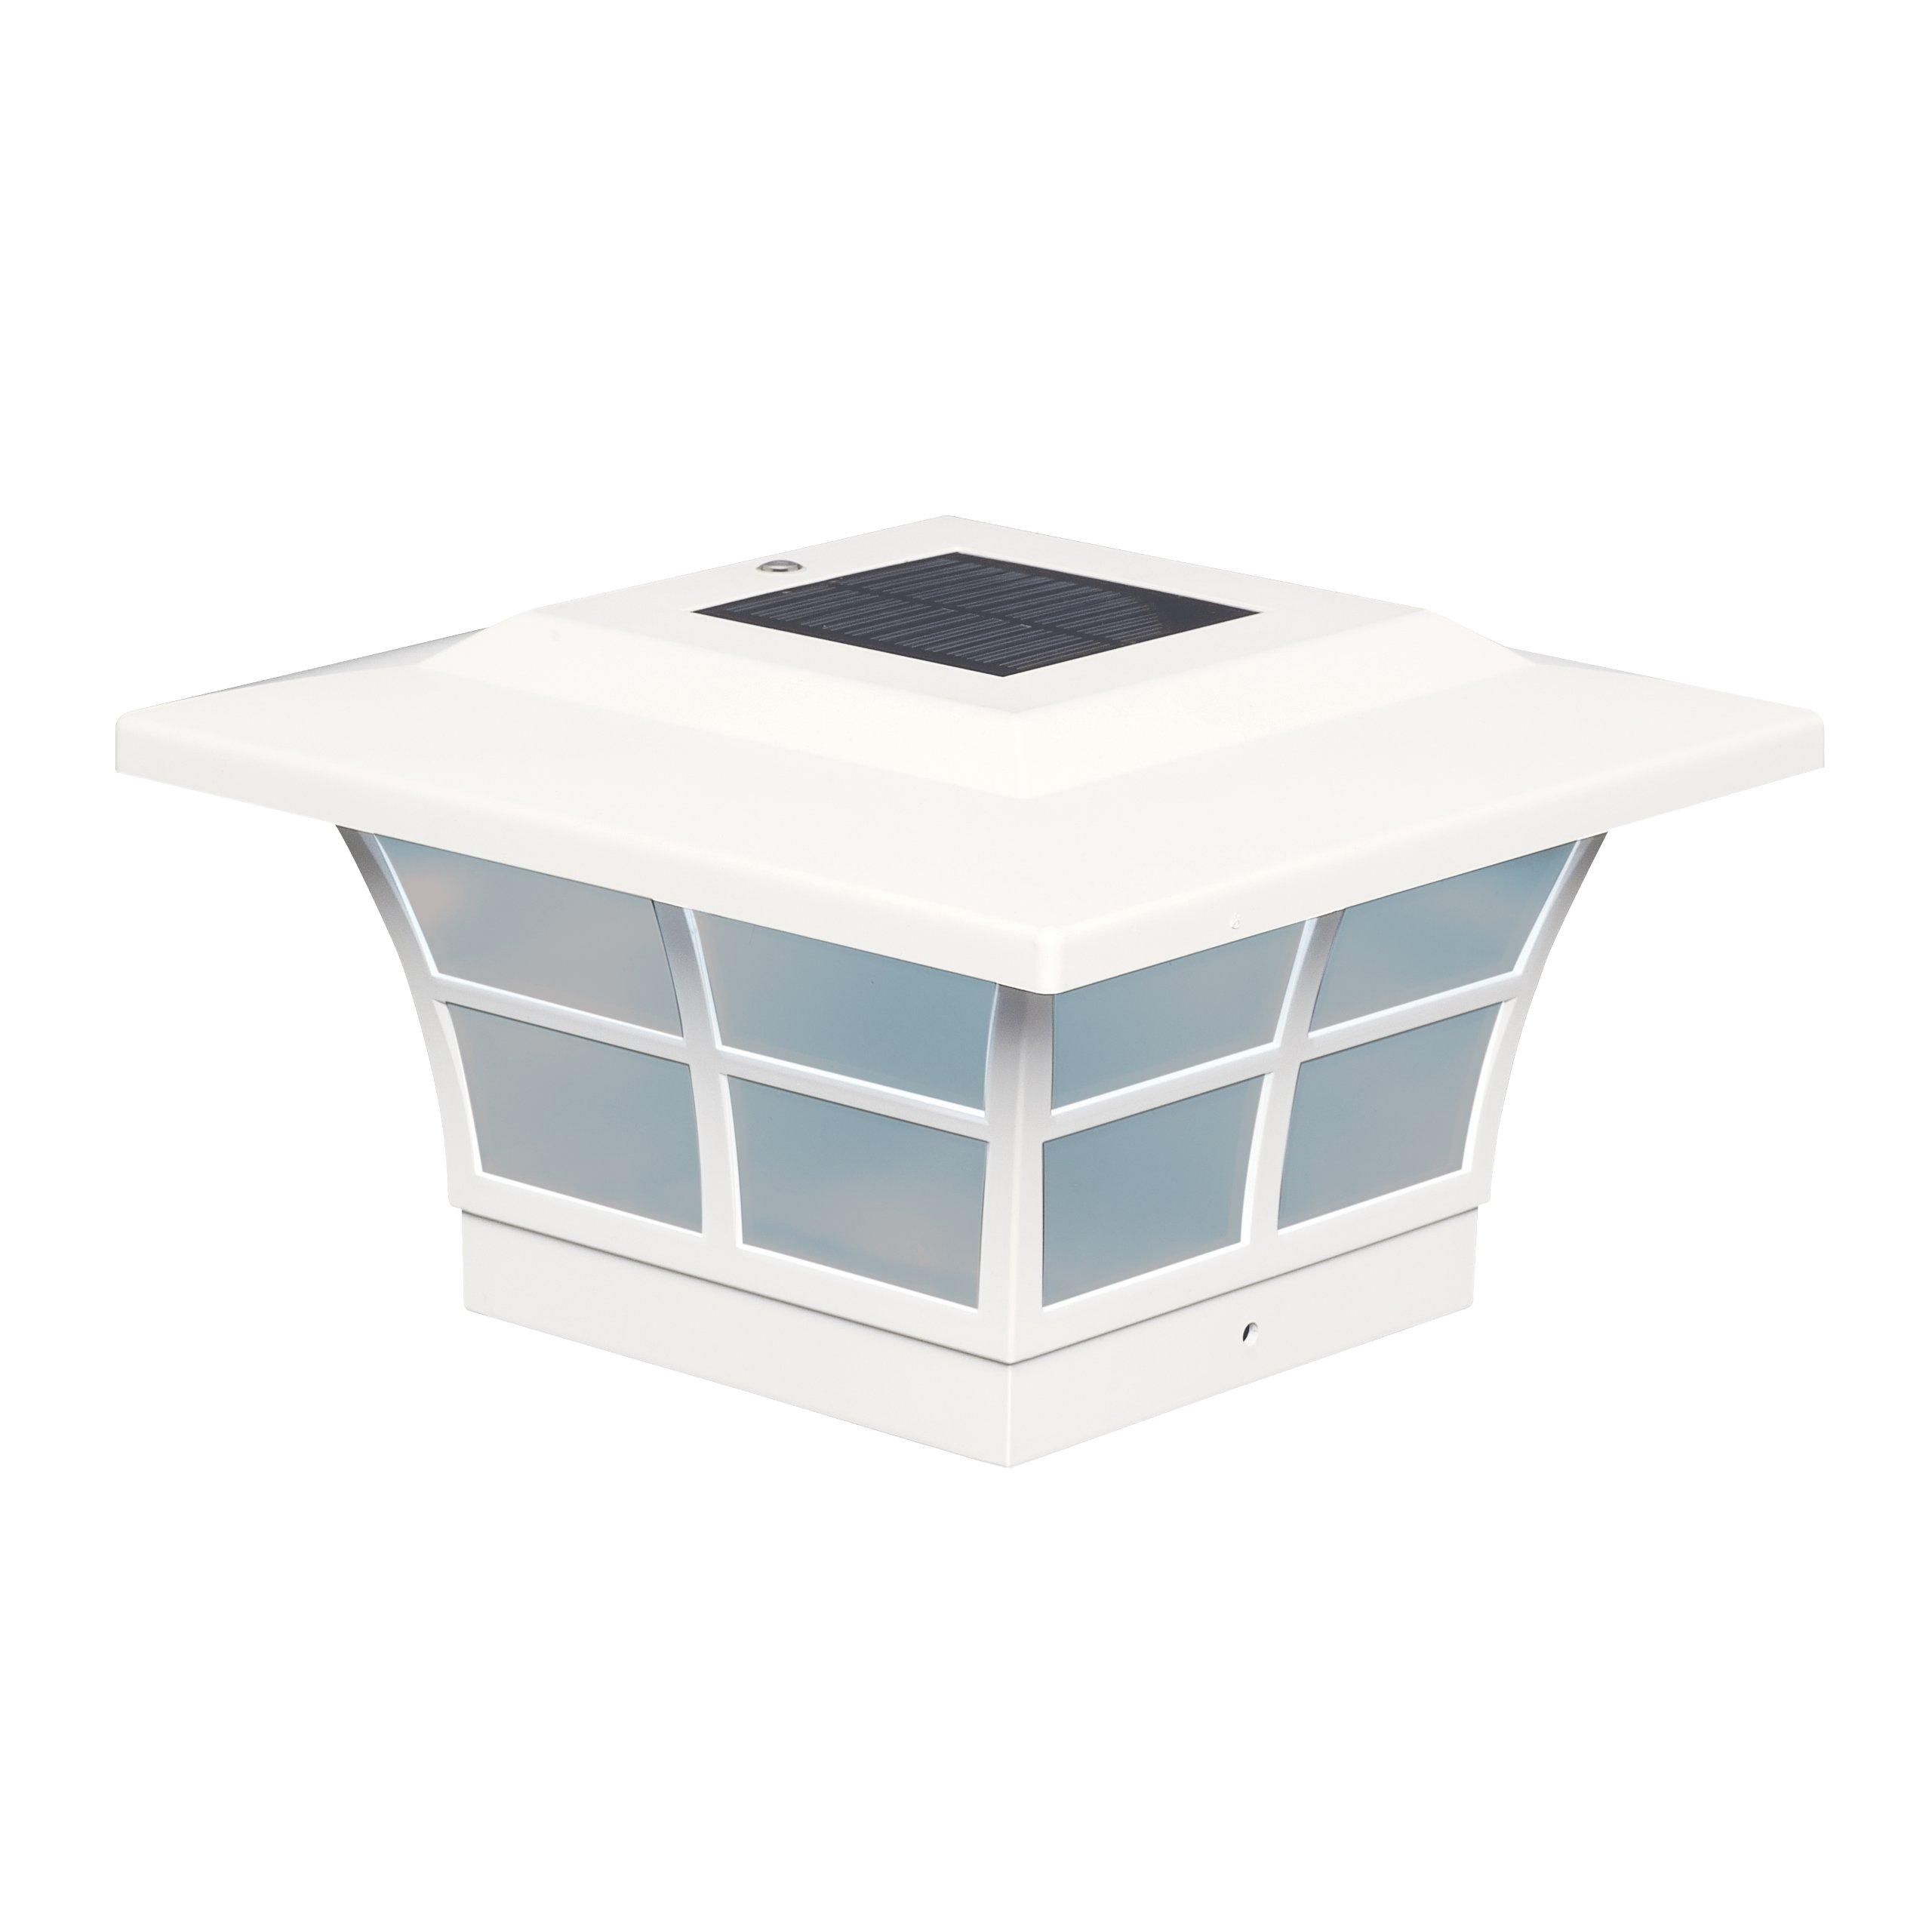 Classy Caps 5x5 PVC Prestige Solar Post CAP SL085 White (8-pack)